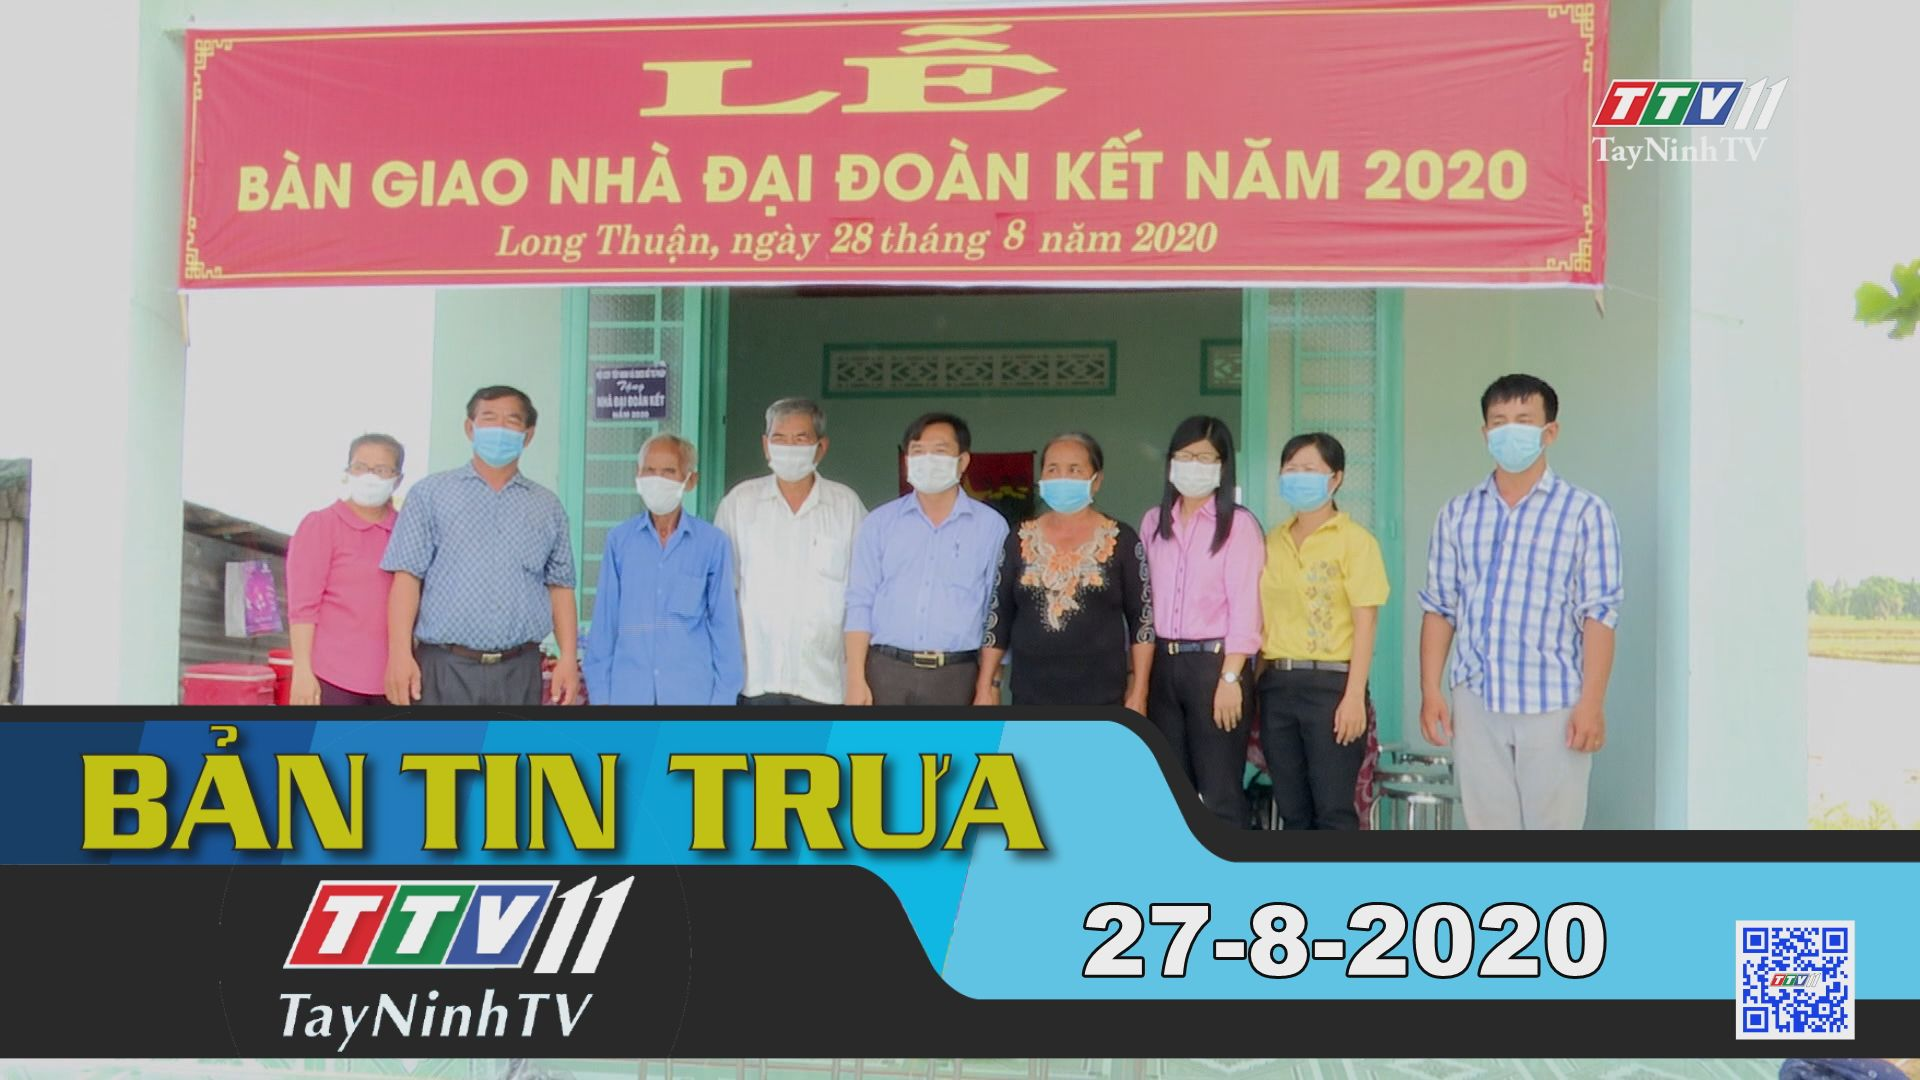 Bản tin trưa 27-8-2020 | Tin tức hôm nay | TayNinhTV